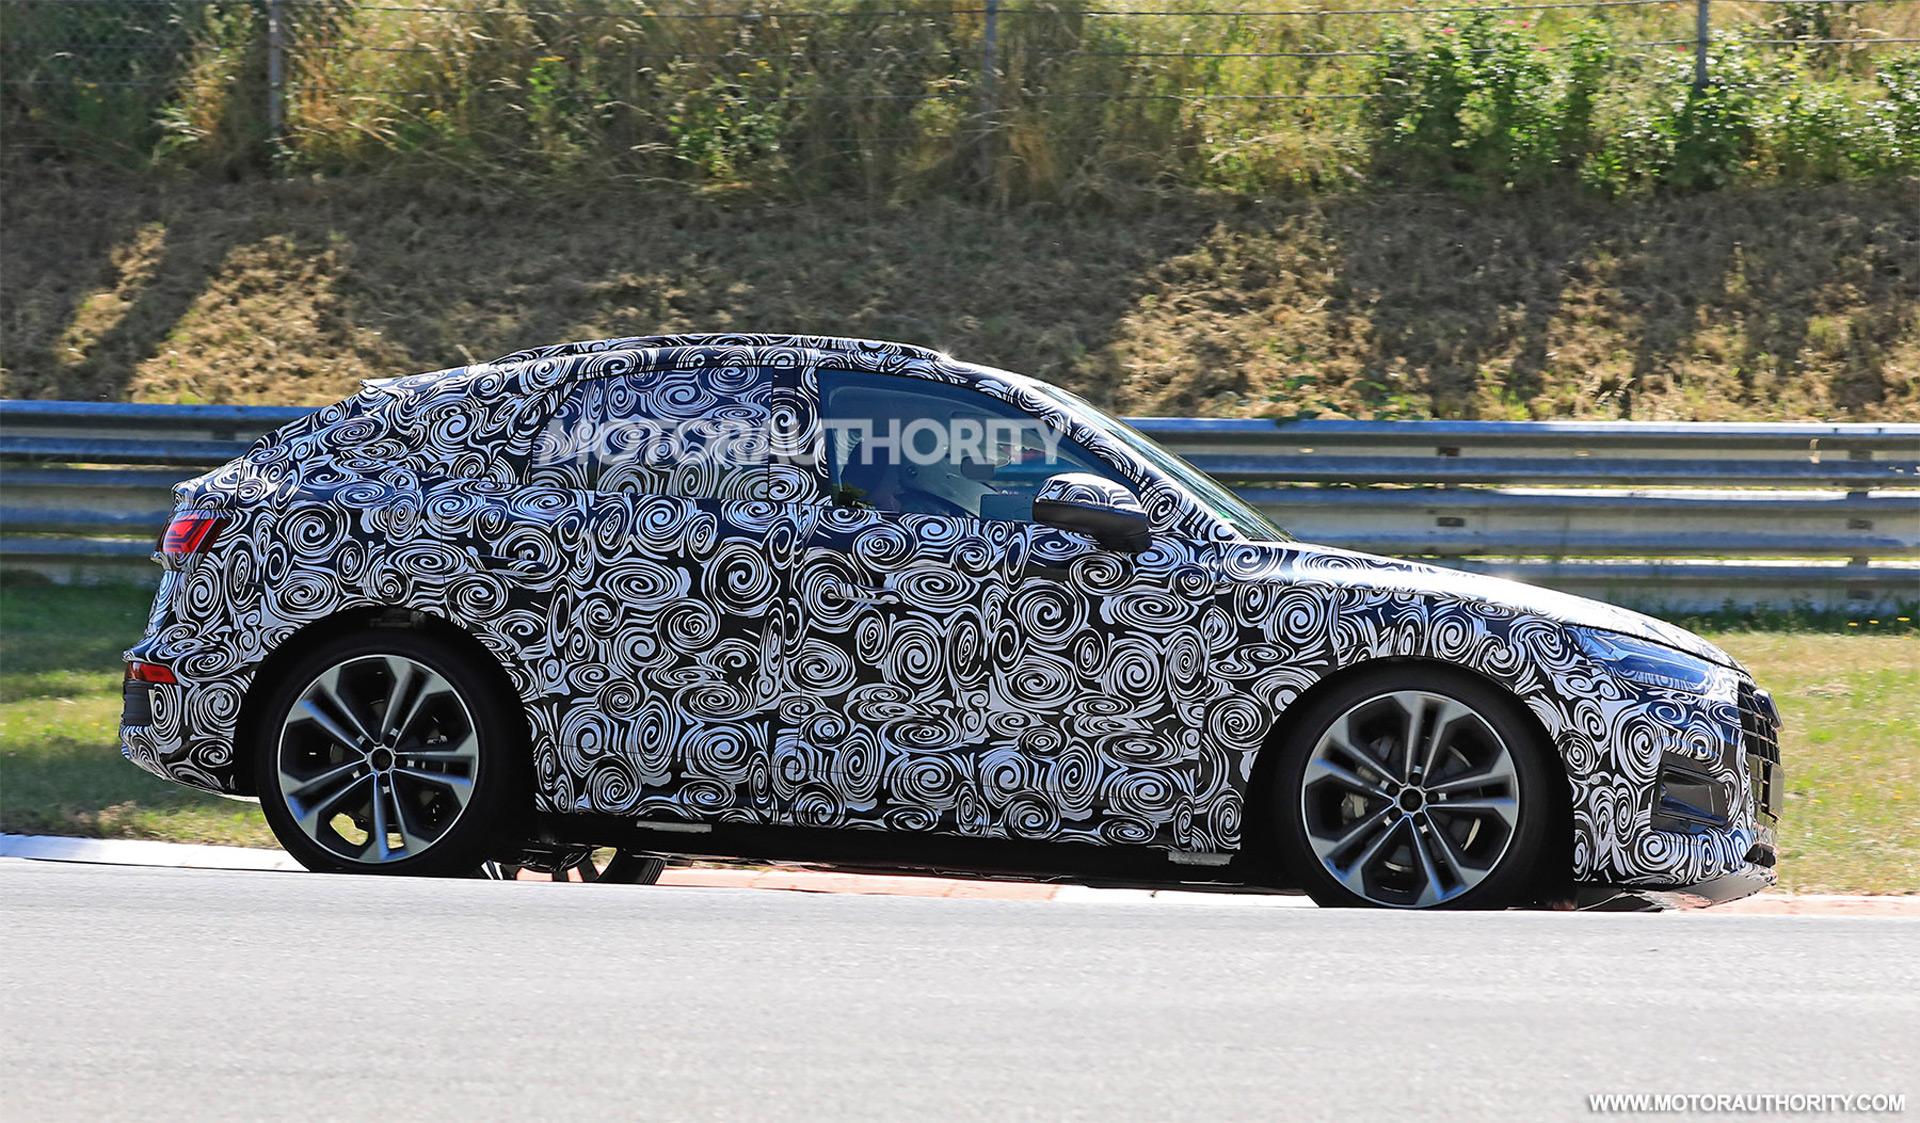 2020 - [Audi] Q5 Sportback - Page 7 2021-audi-q5-sportback-spy-shots--picture-credits-baldauf-sb-medien_100753280_h